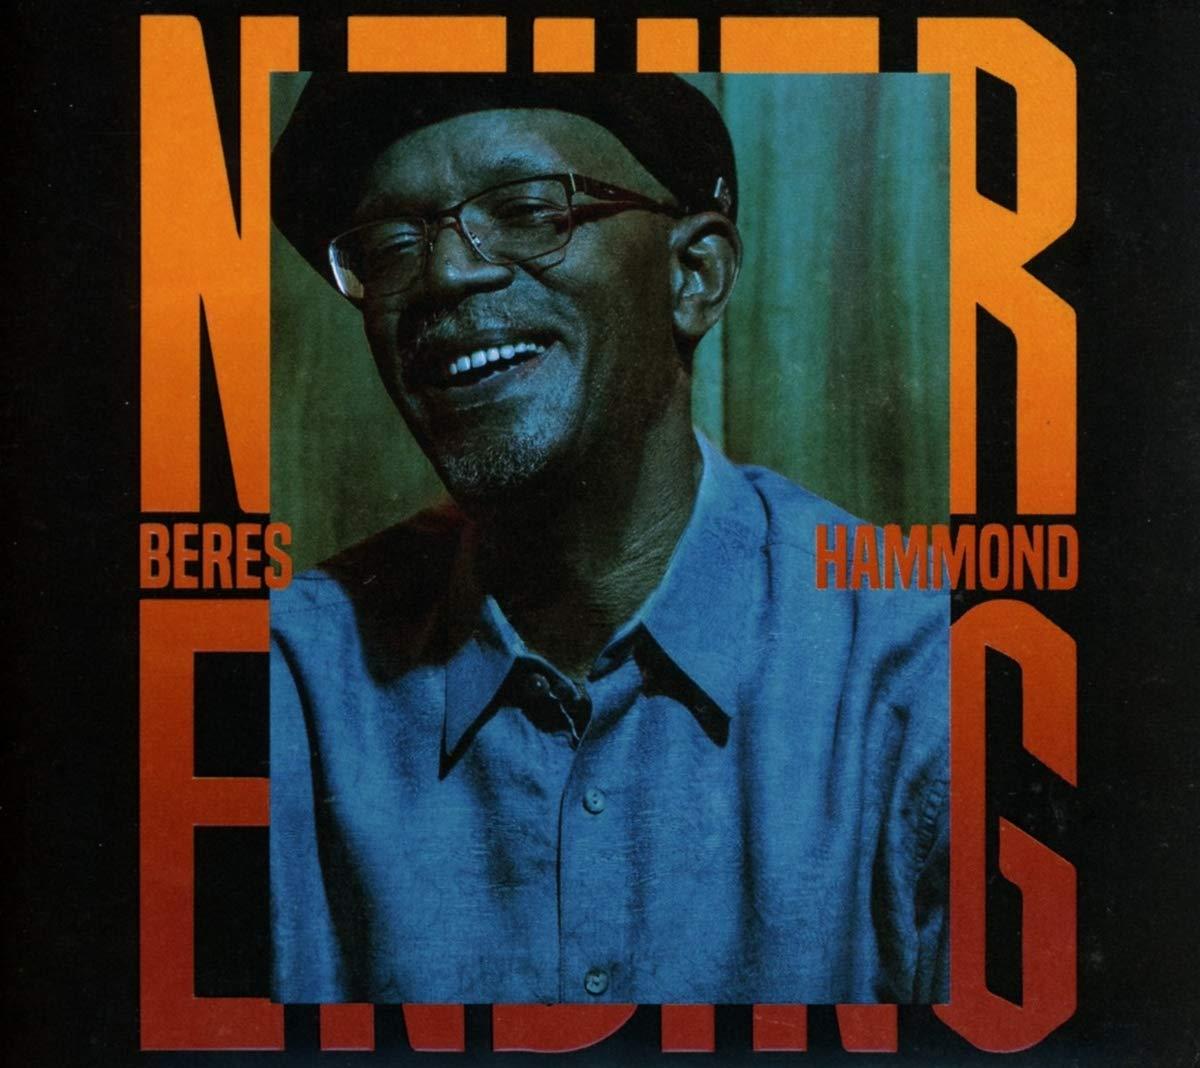 beres hammond i feel good free mp3 download